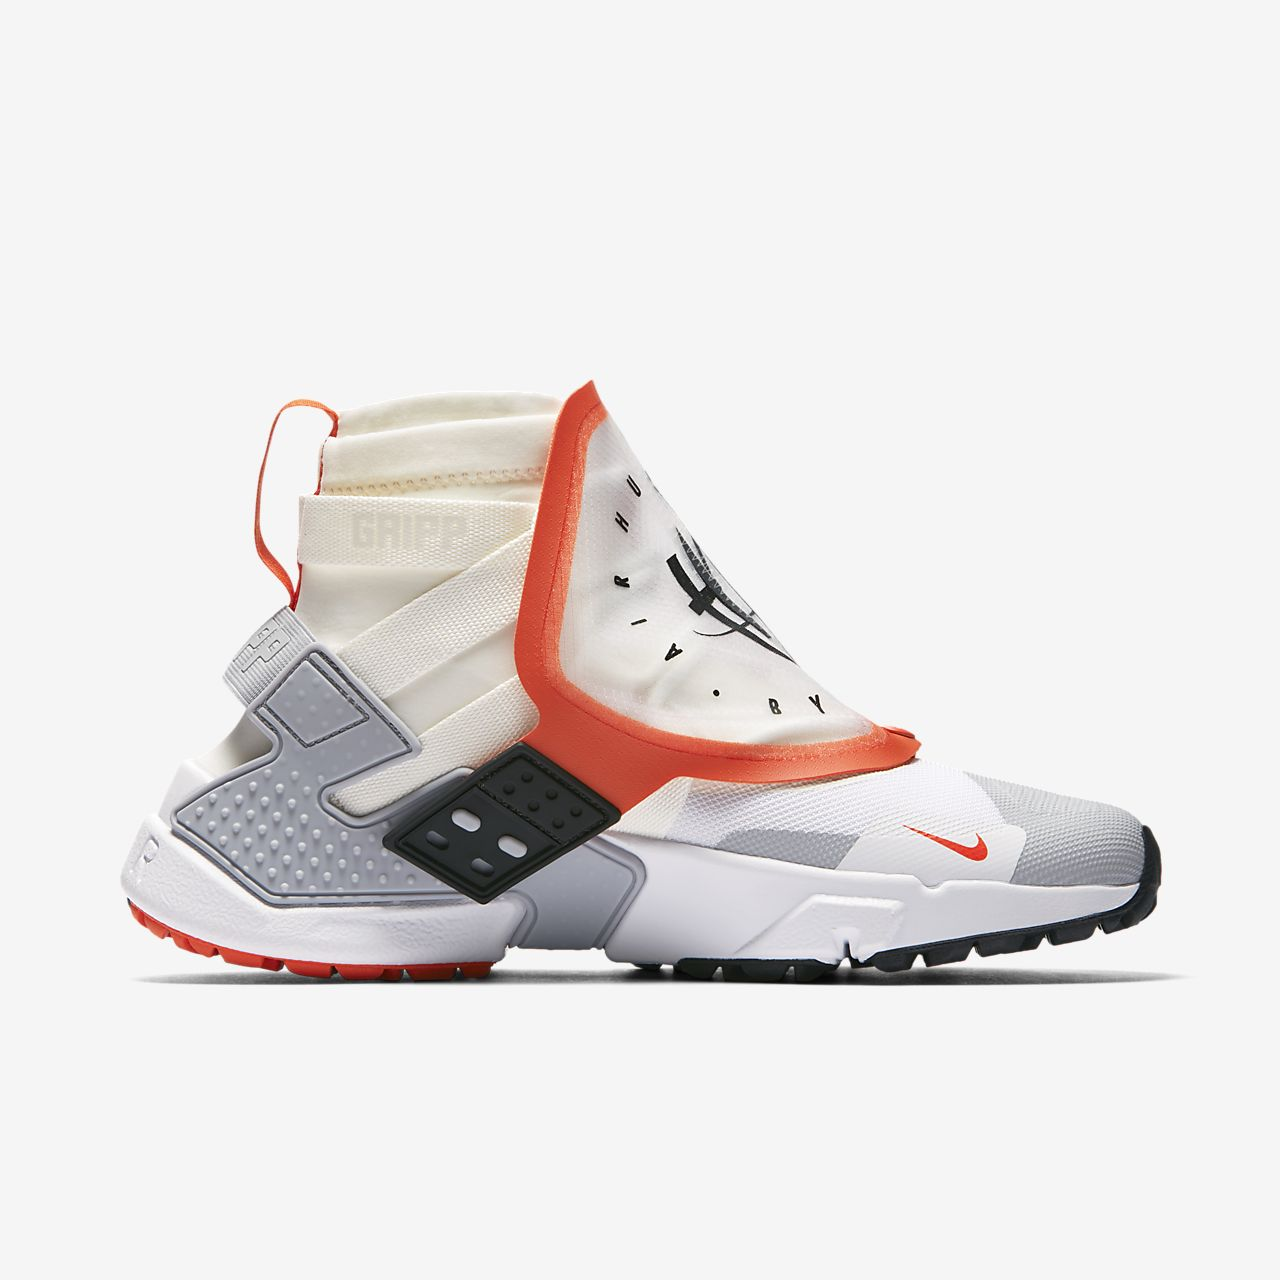 6f26e8ad51c6 Nike Air Huarache Gripp Men s Shoe. Nike.com